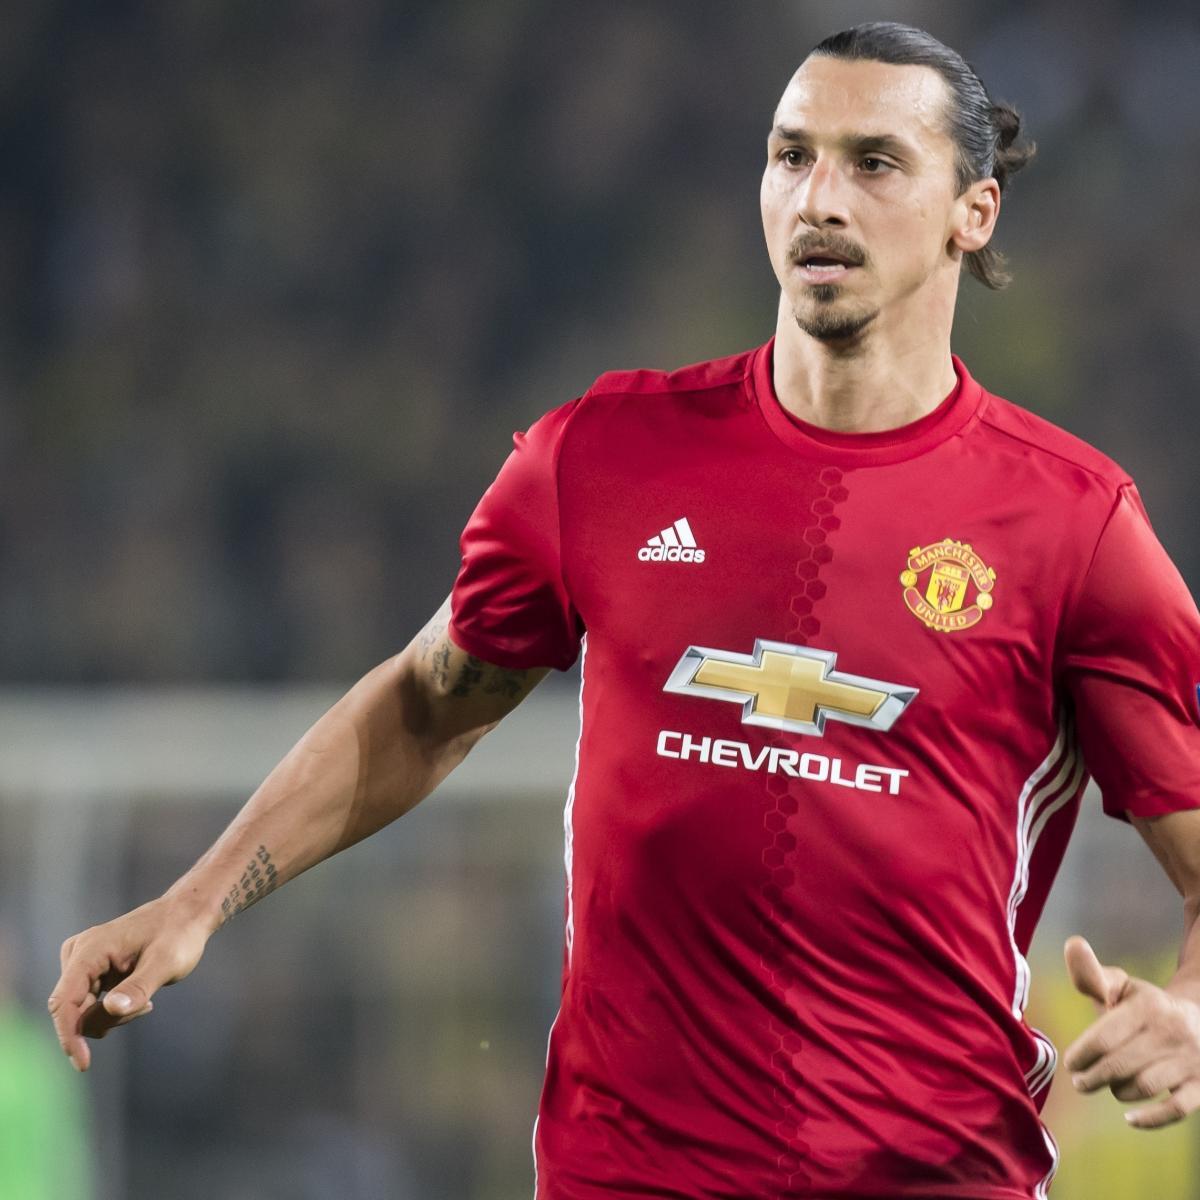 Manchester United Transfer News Latest Rumours On Lucas: Manchester United Transfer News: Latest Zlatan Ibrahimovic